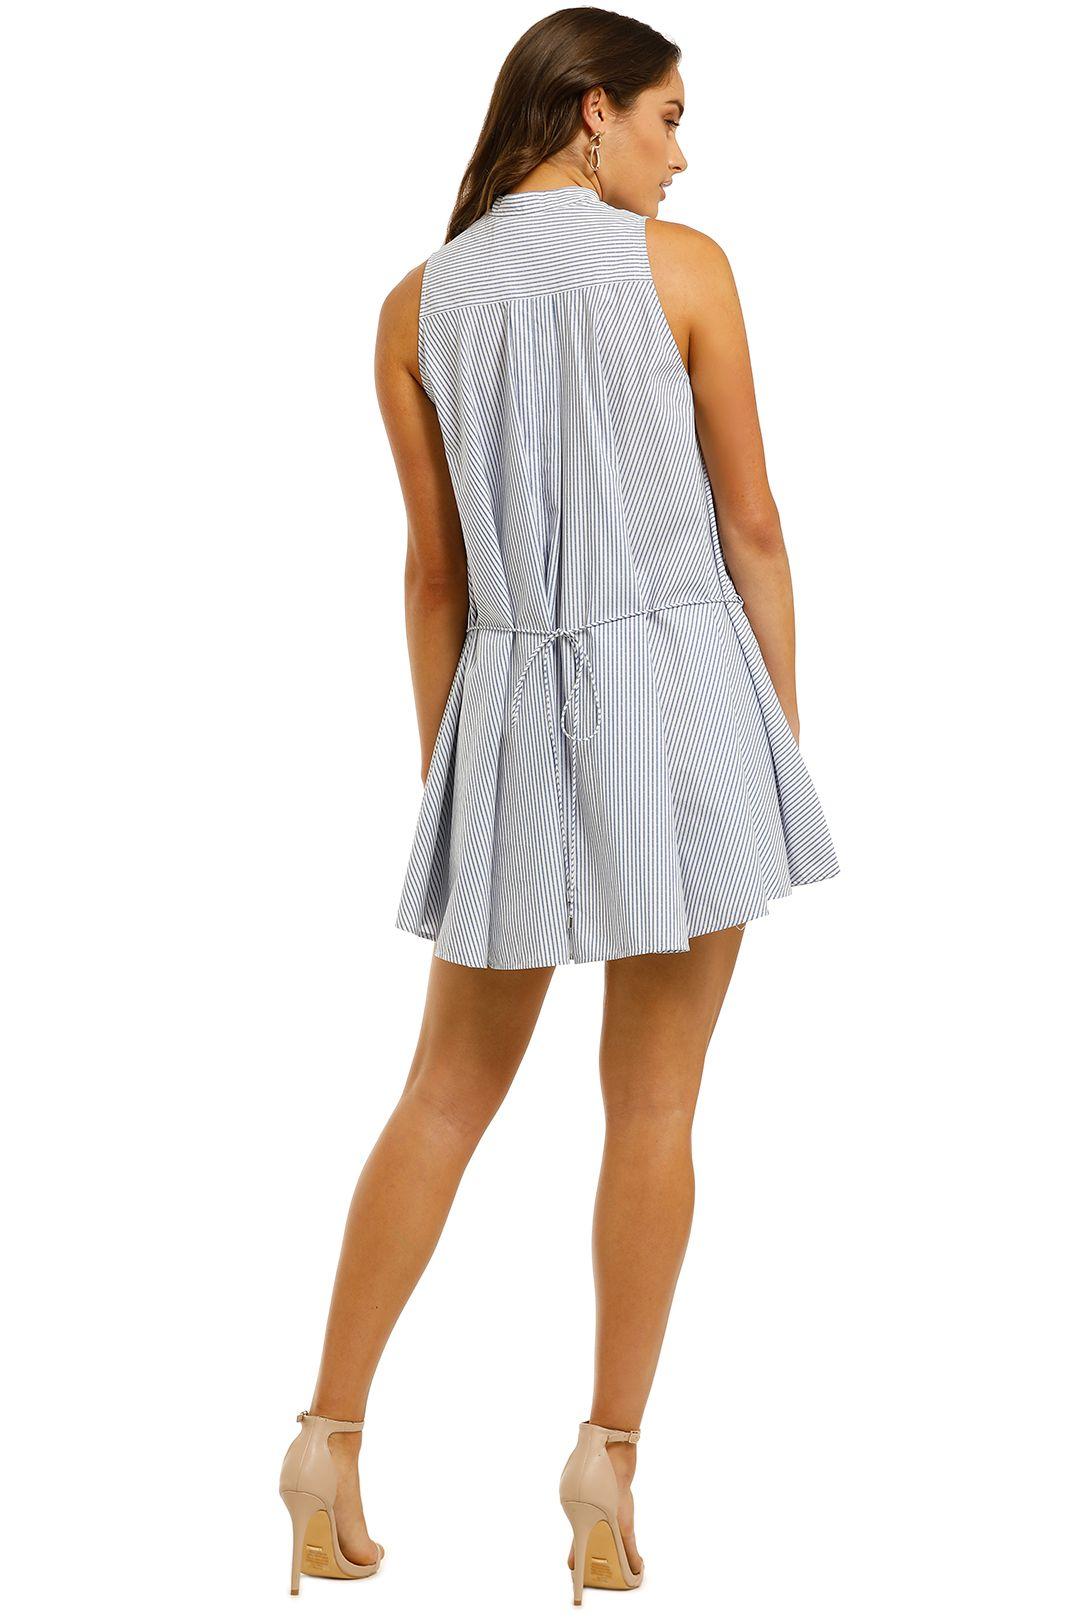 Lover-Nomad-Stripe-Swing-Dress-Stripe-Back